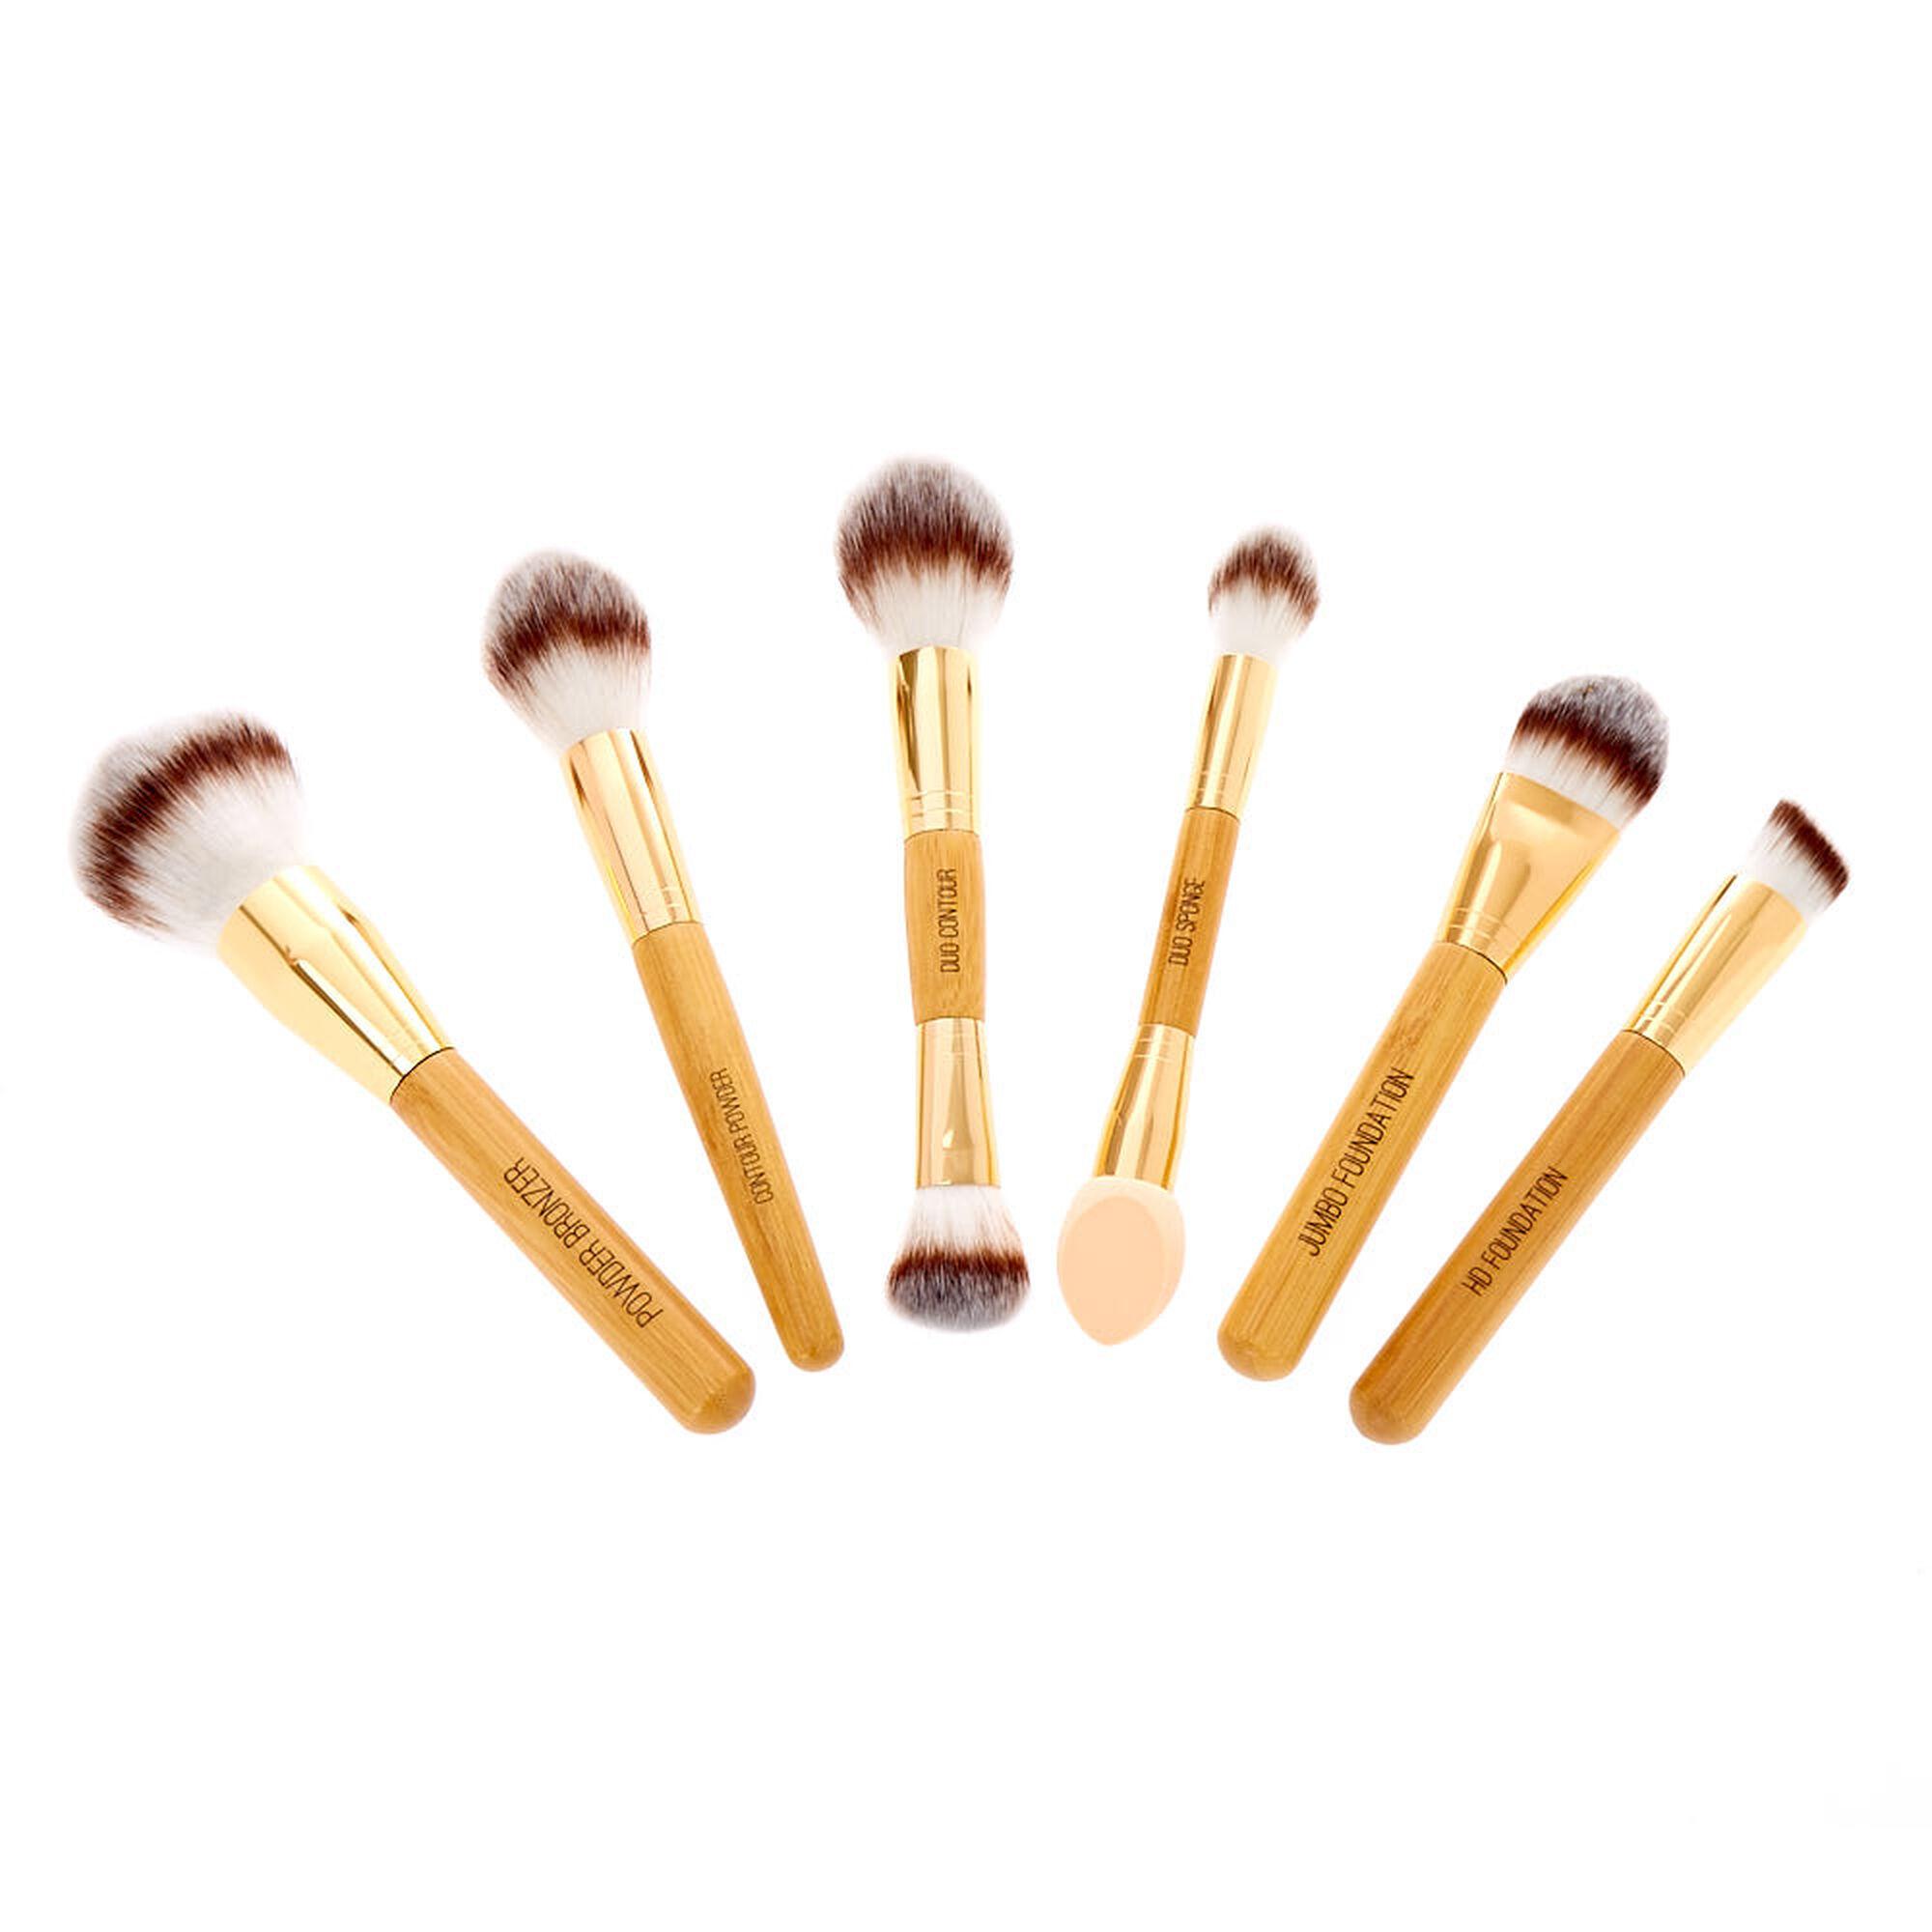 bamboo makeup brushes. 6 pack makeup bamboo brush gift set, brushes